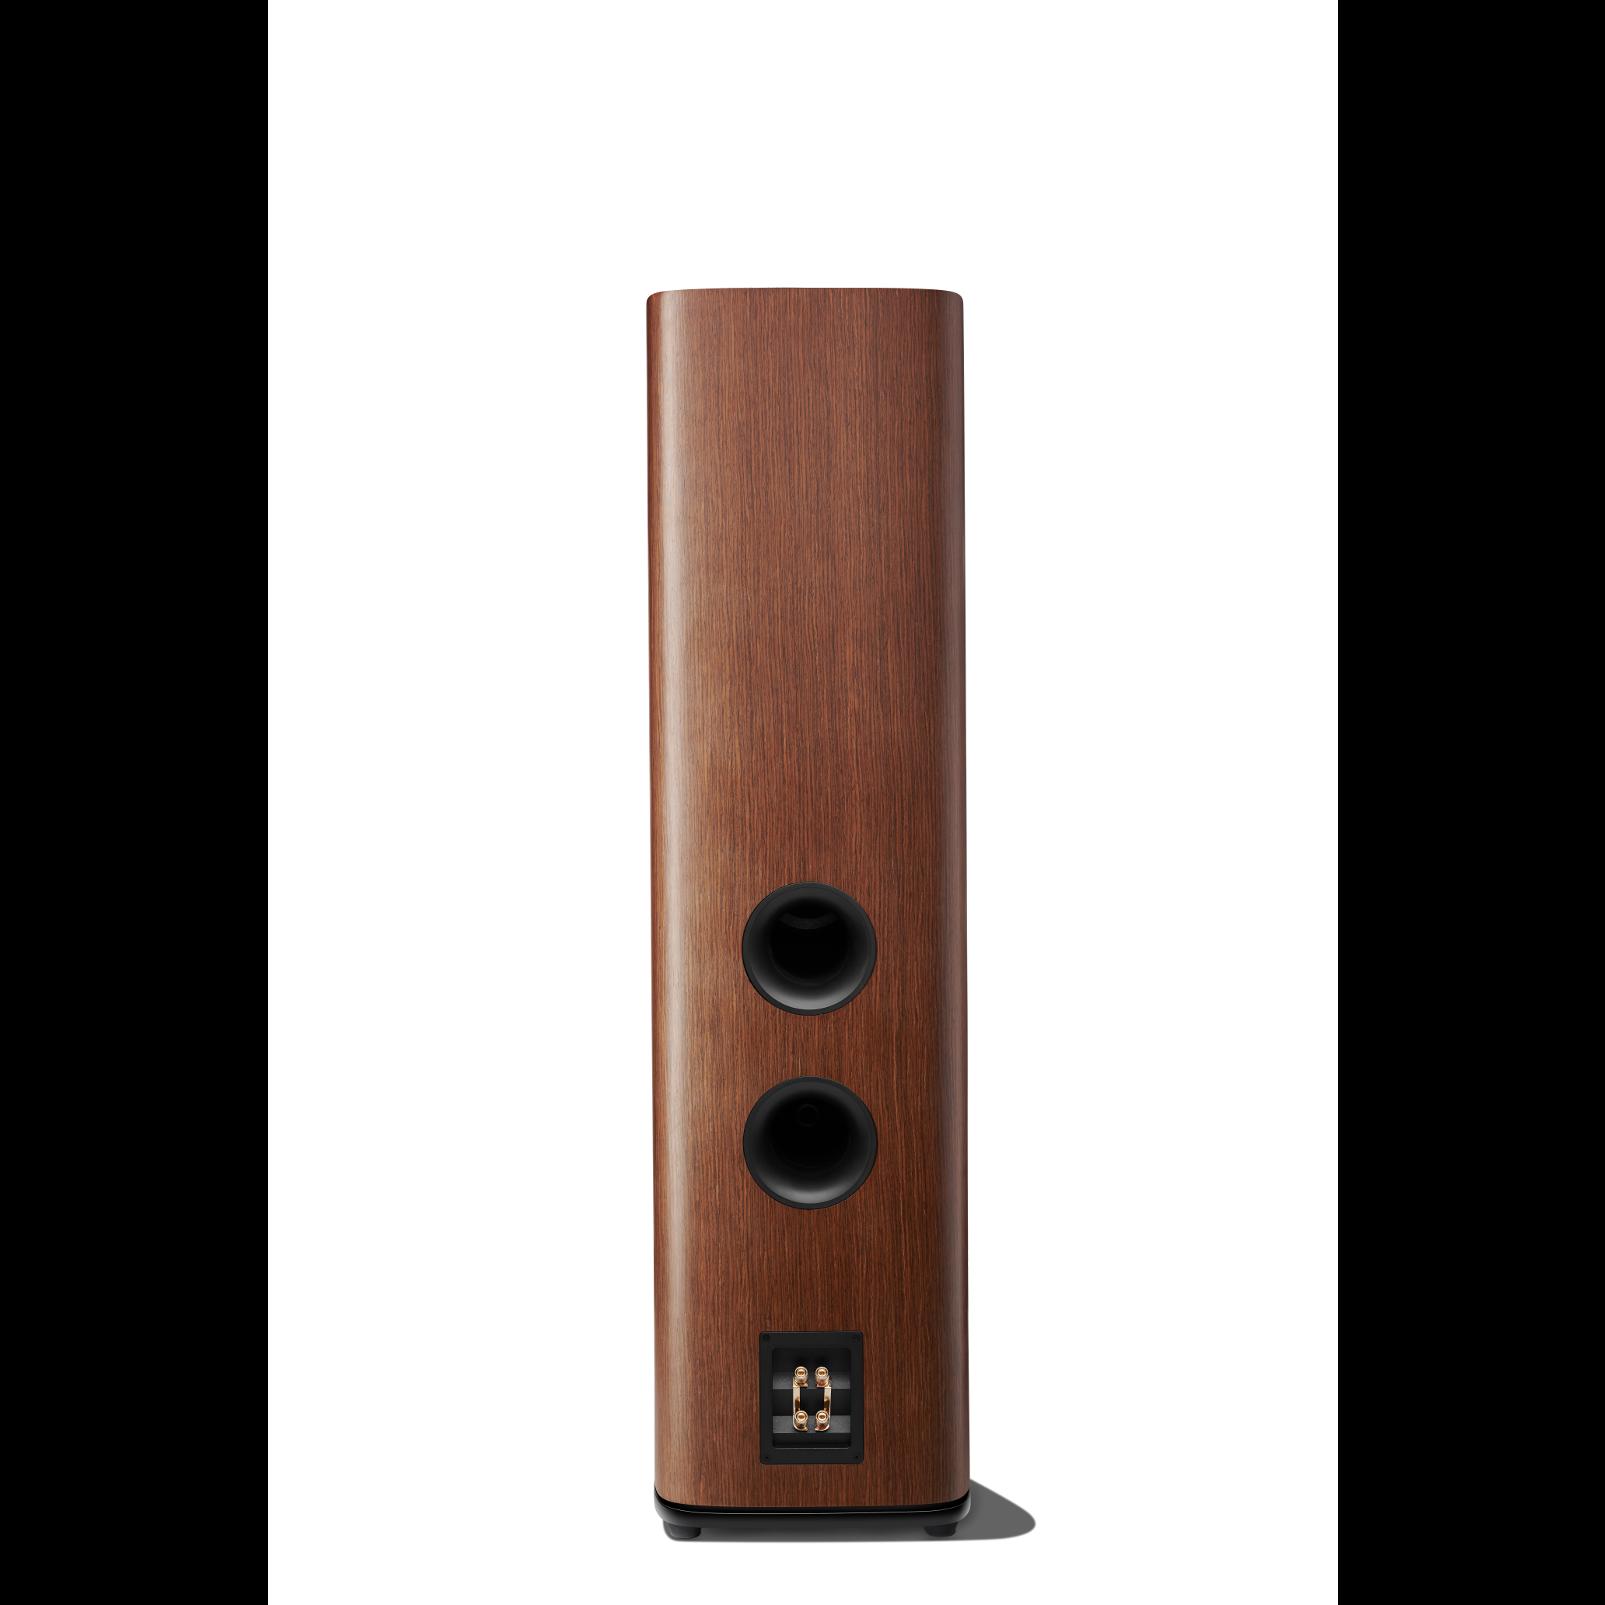 HDI-3800 - Walnut - 2 ½-way Triple 8-inch (200mm) Floorstanding Loudspeaker - Back